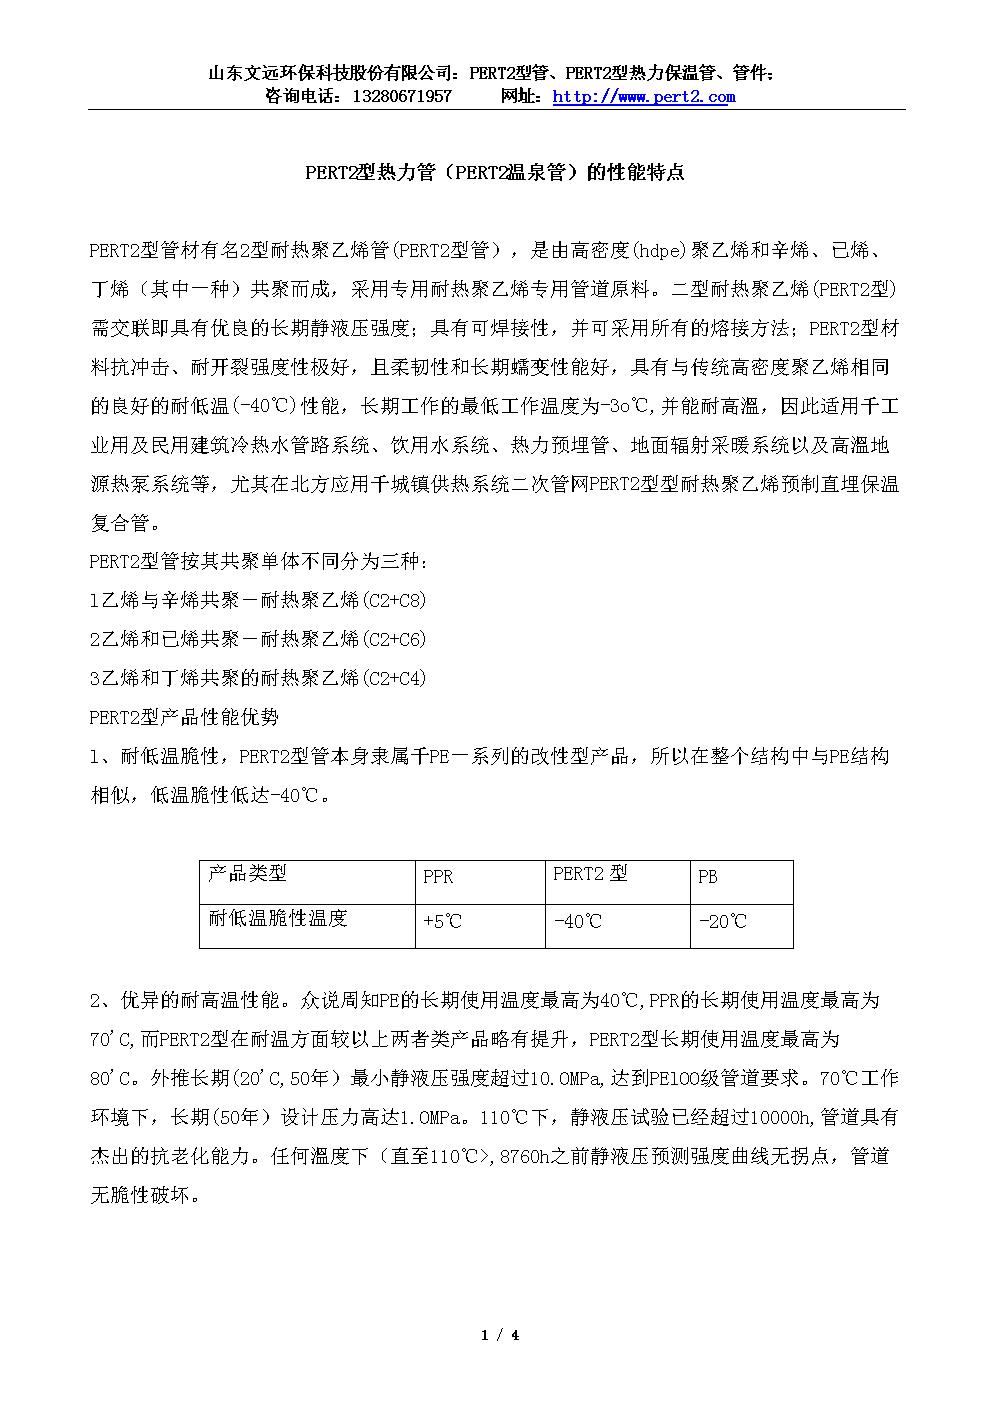 PERT2型热力管(PERT2型温泉管)的性能特点.docx